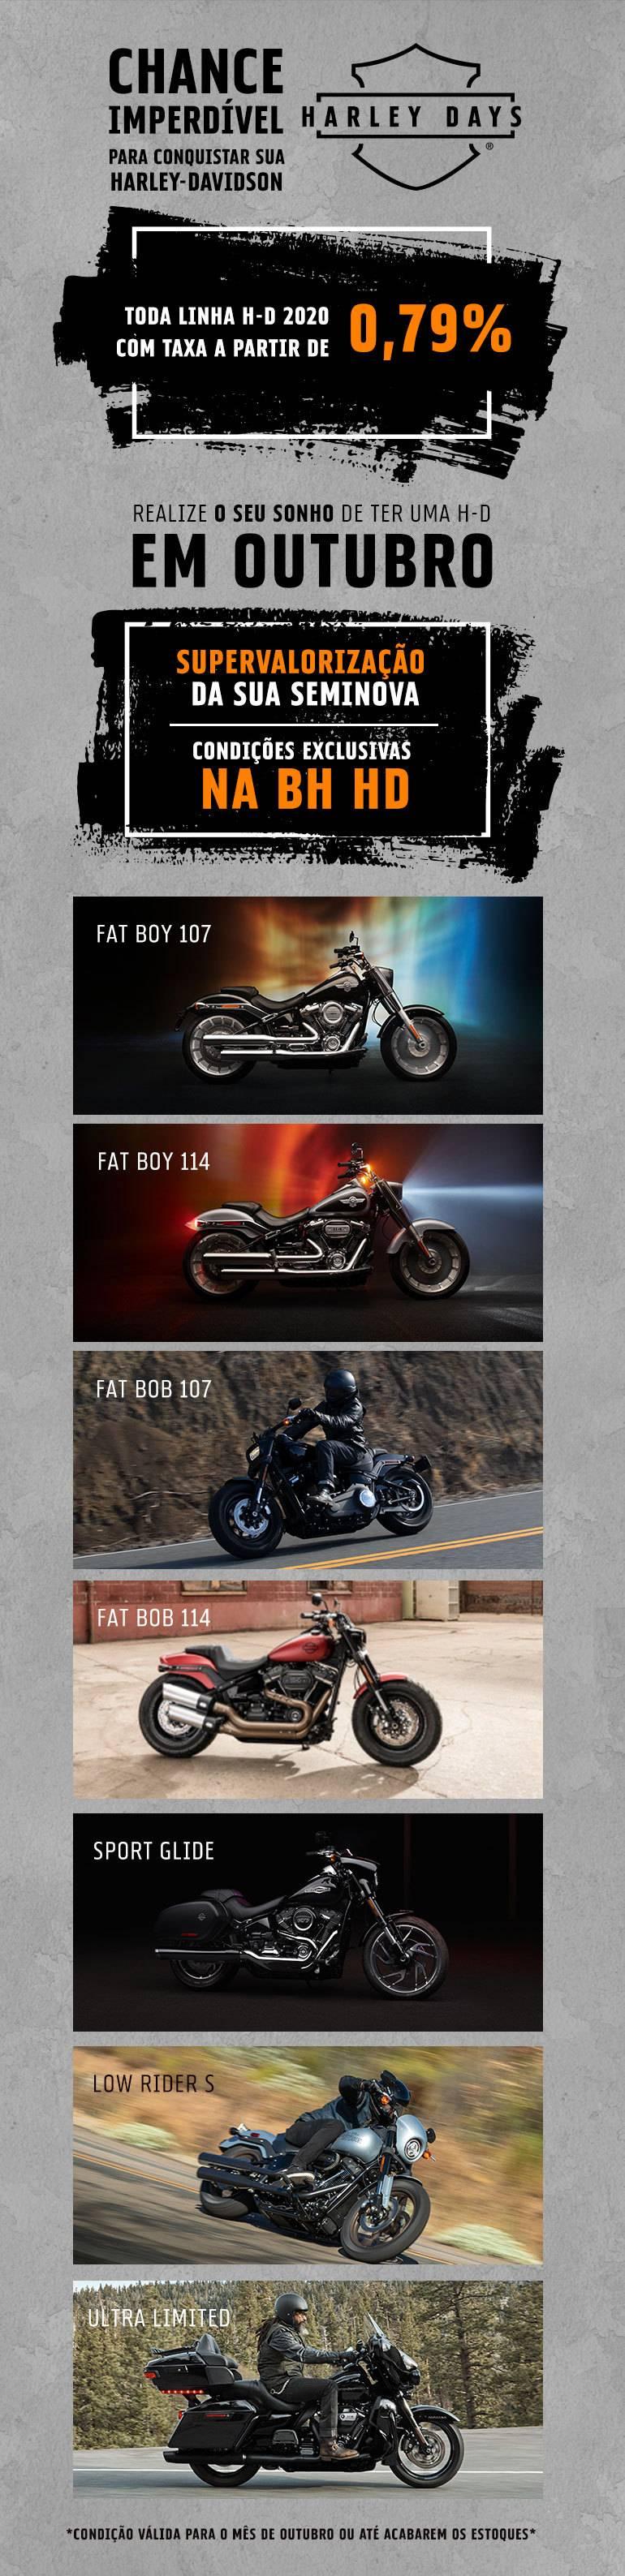 Oferta Harley 0km